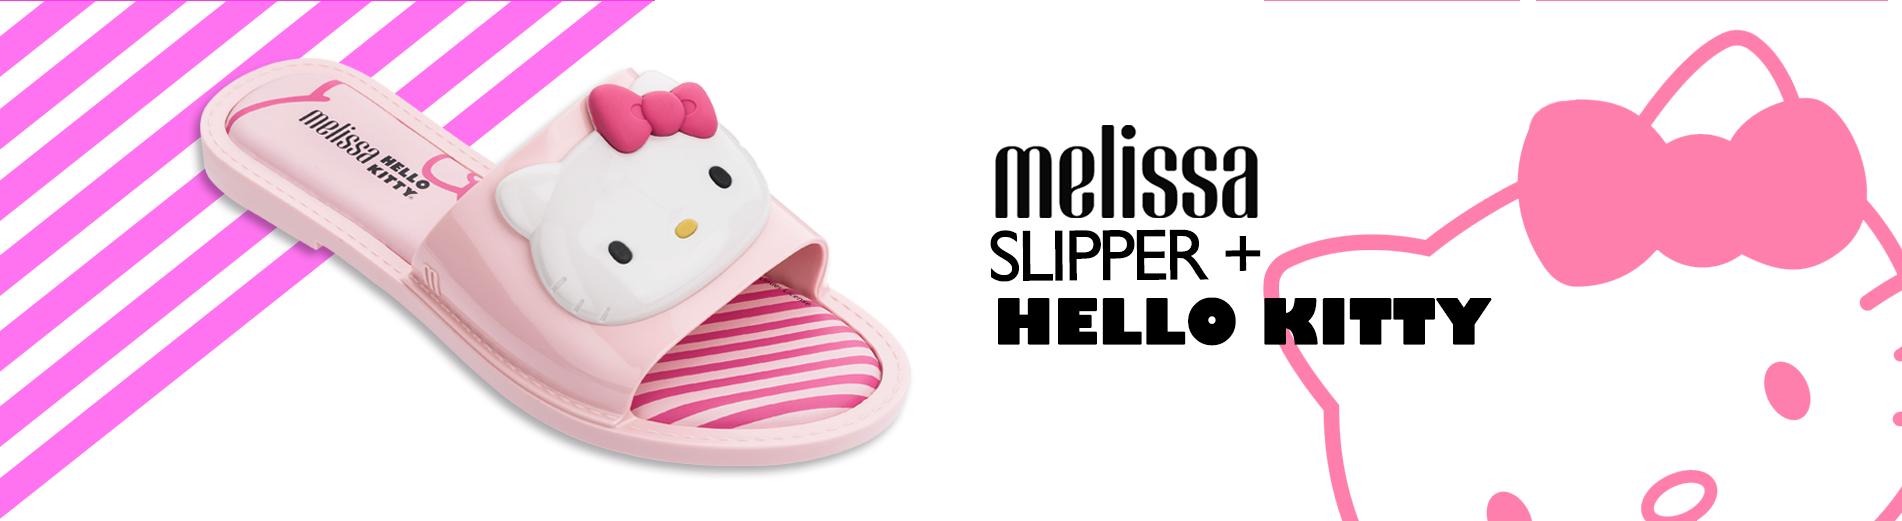 melissa slipper hello kitty